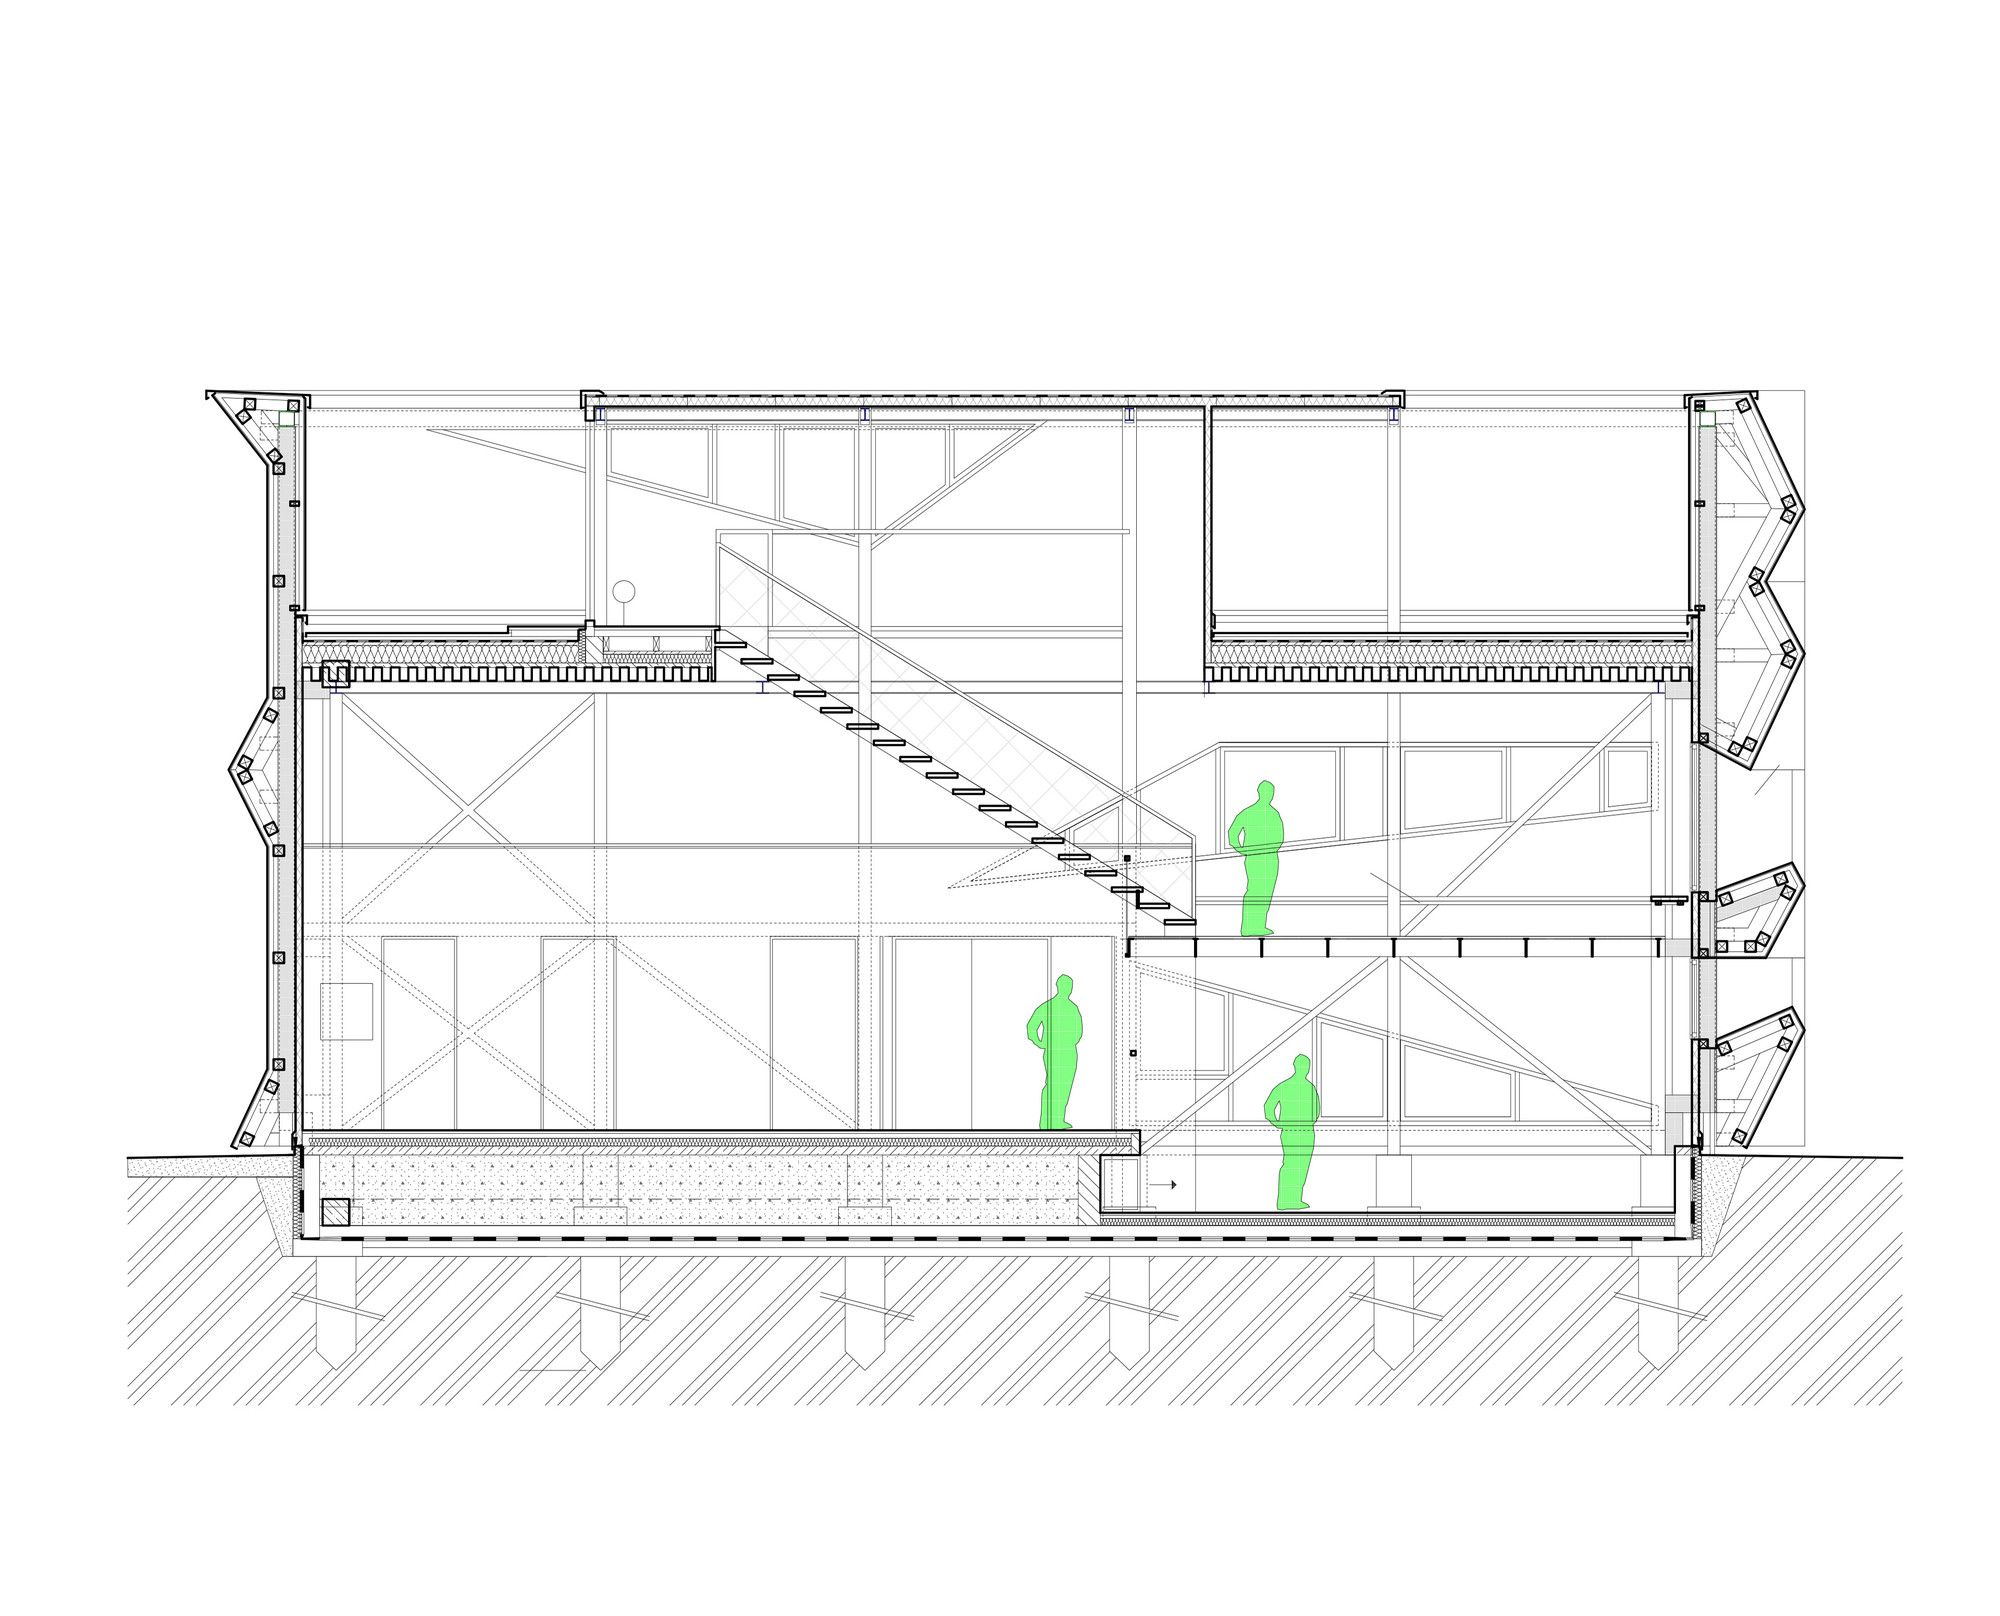 hight resolution of heat exchanger va eck section